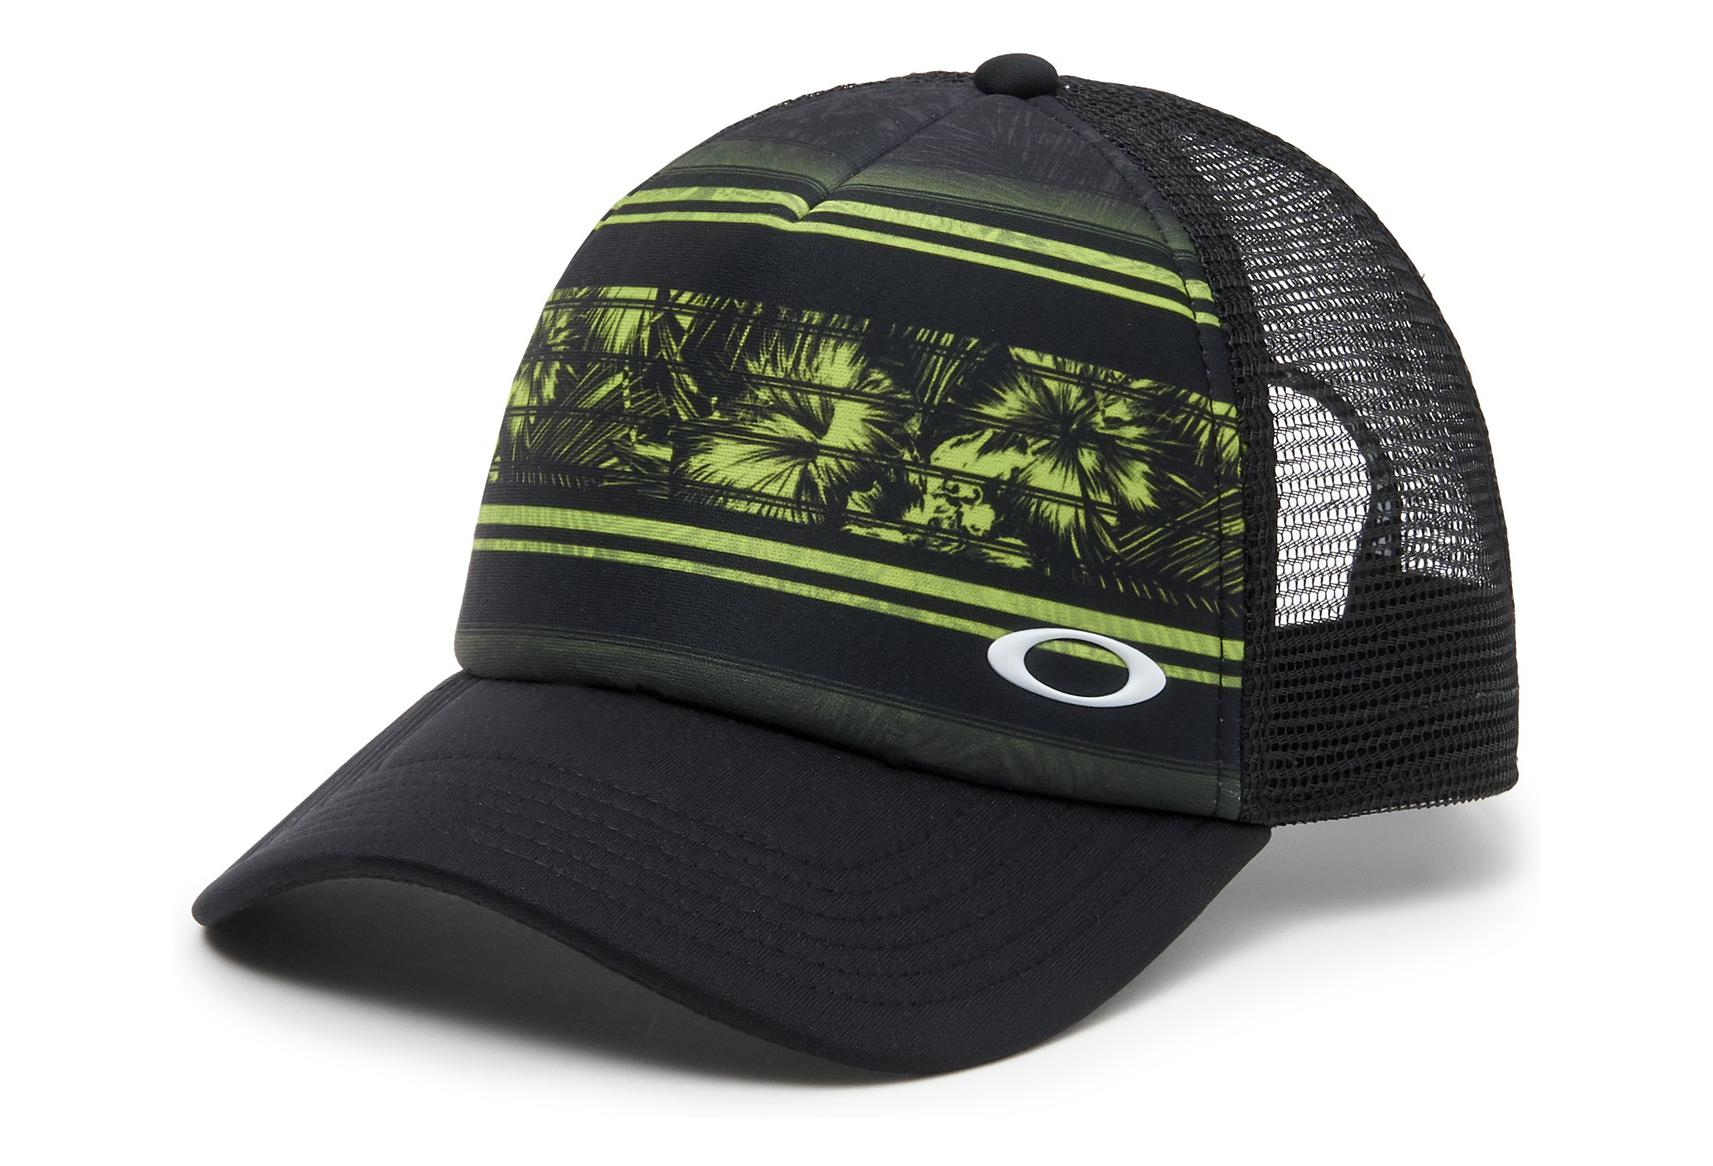 new arrival 8427f 90278 cheapest oakley cap mesh sublimated trucker olive green black a8d0c 8bdcb